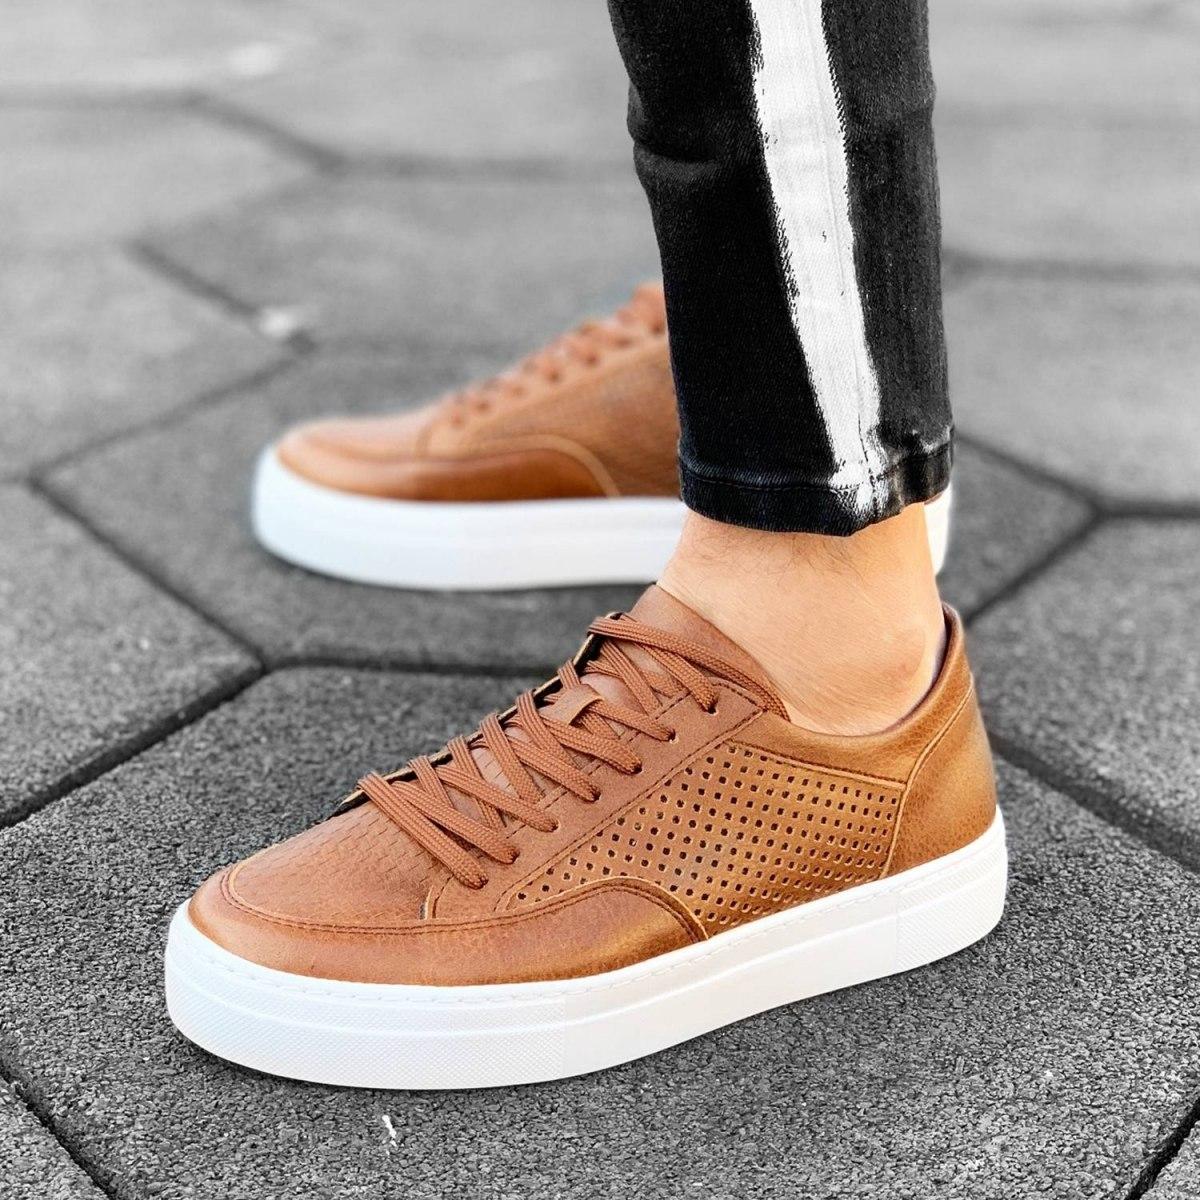 Plexus Sneakers in Tan-White Mv Premium Brand - 1